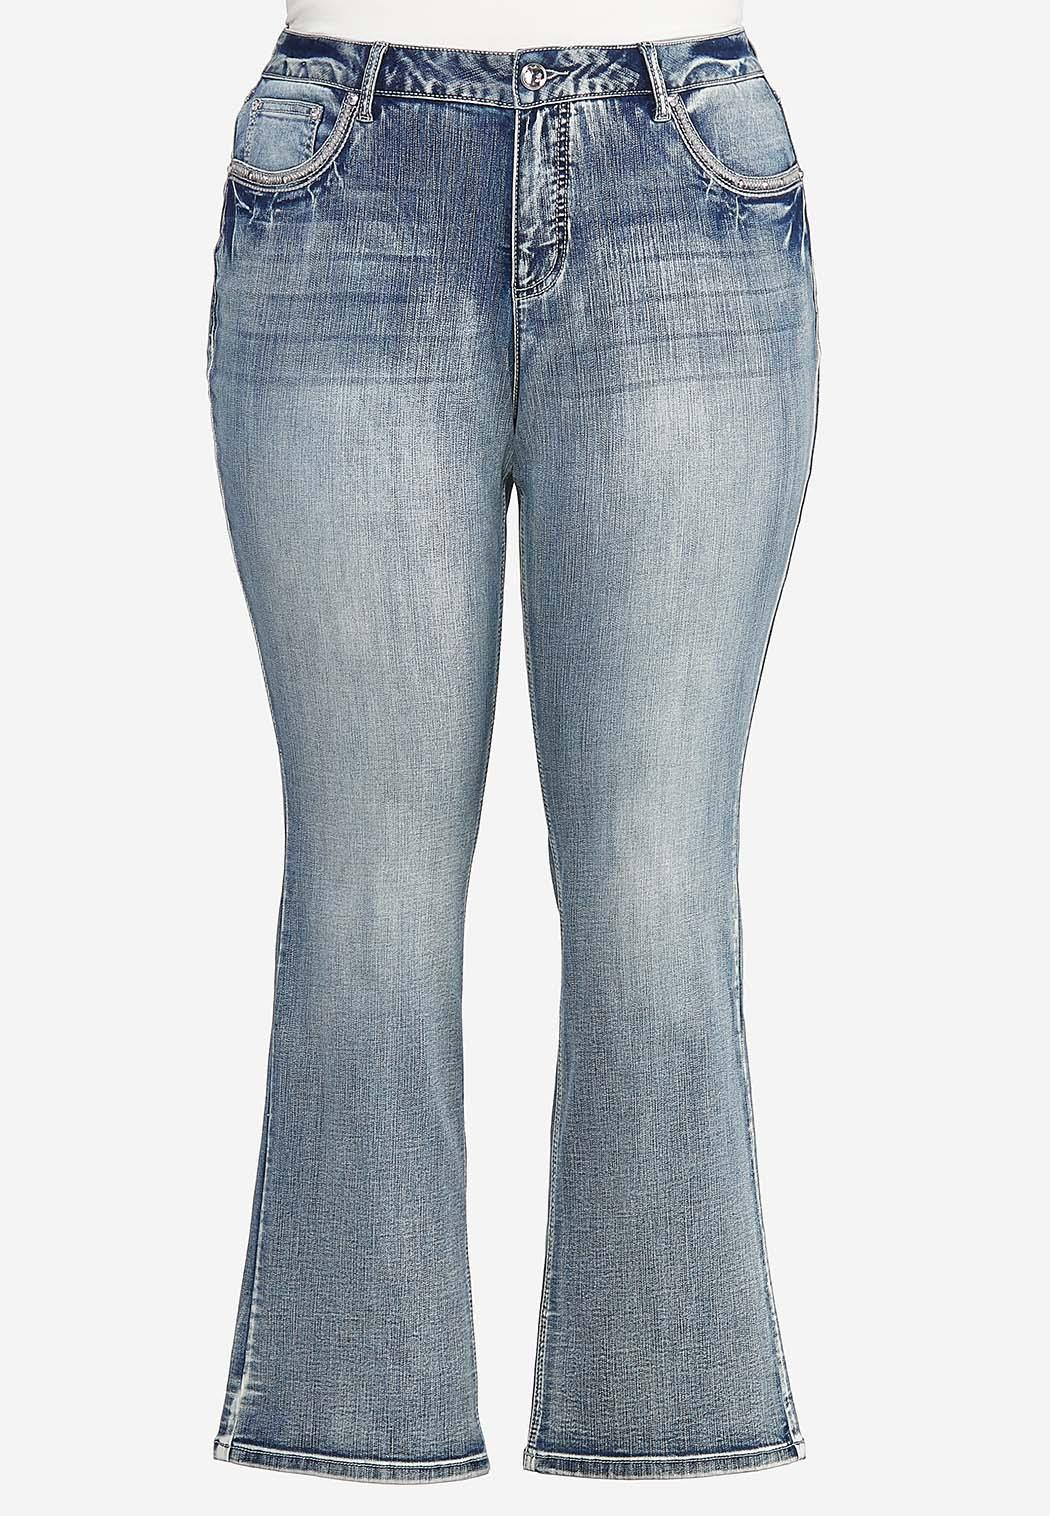 Plus Petite Embellished Bootcut Jeans (Item #44400740)